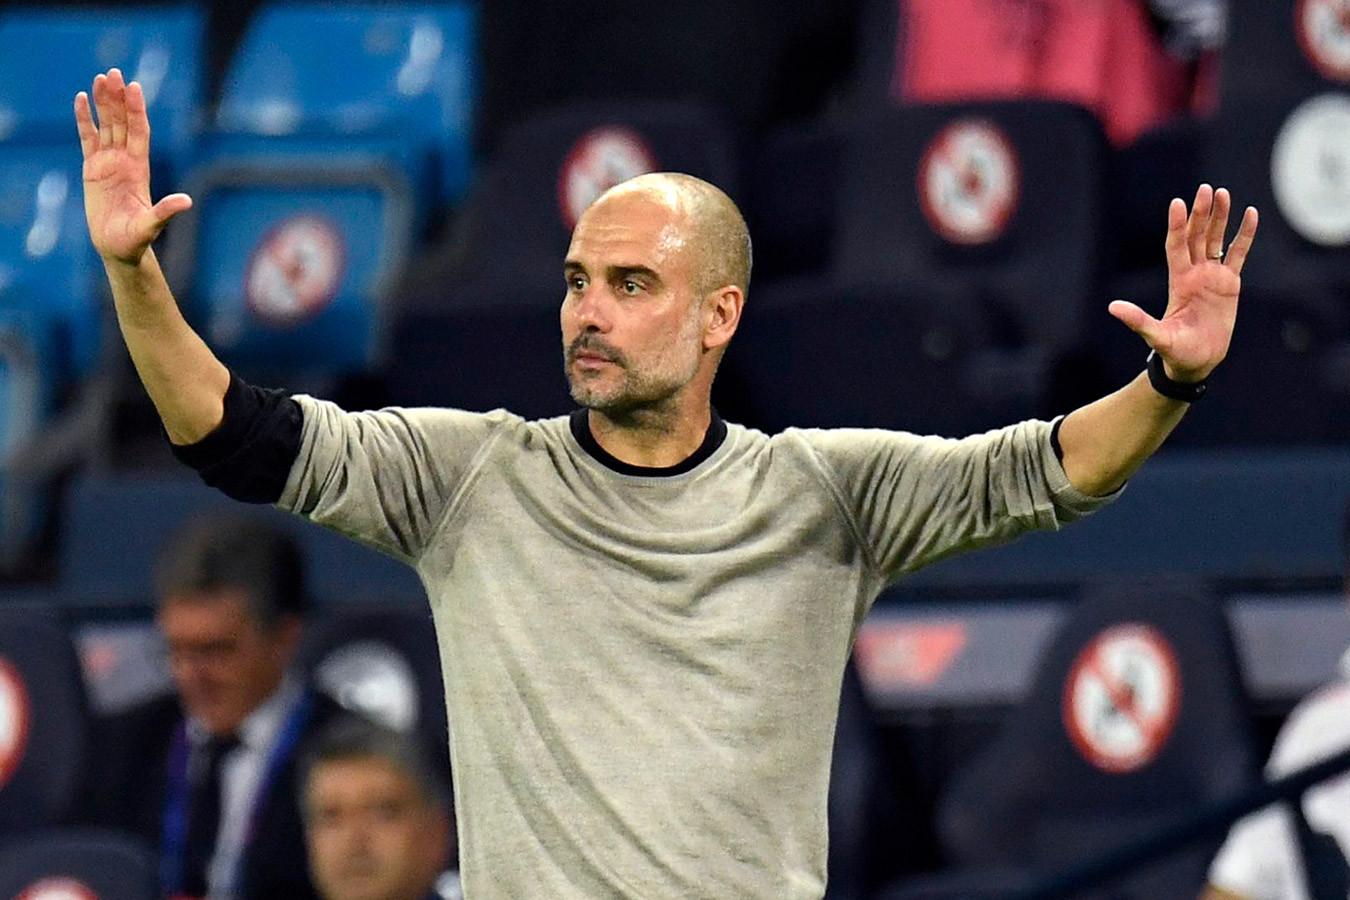 «Манчестер Сити» объявил о продлении контракта с Хосепом Гвардиолой